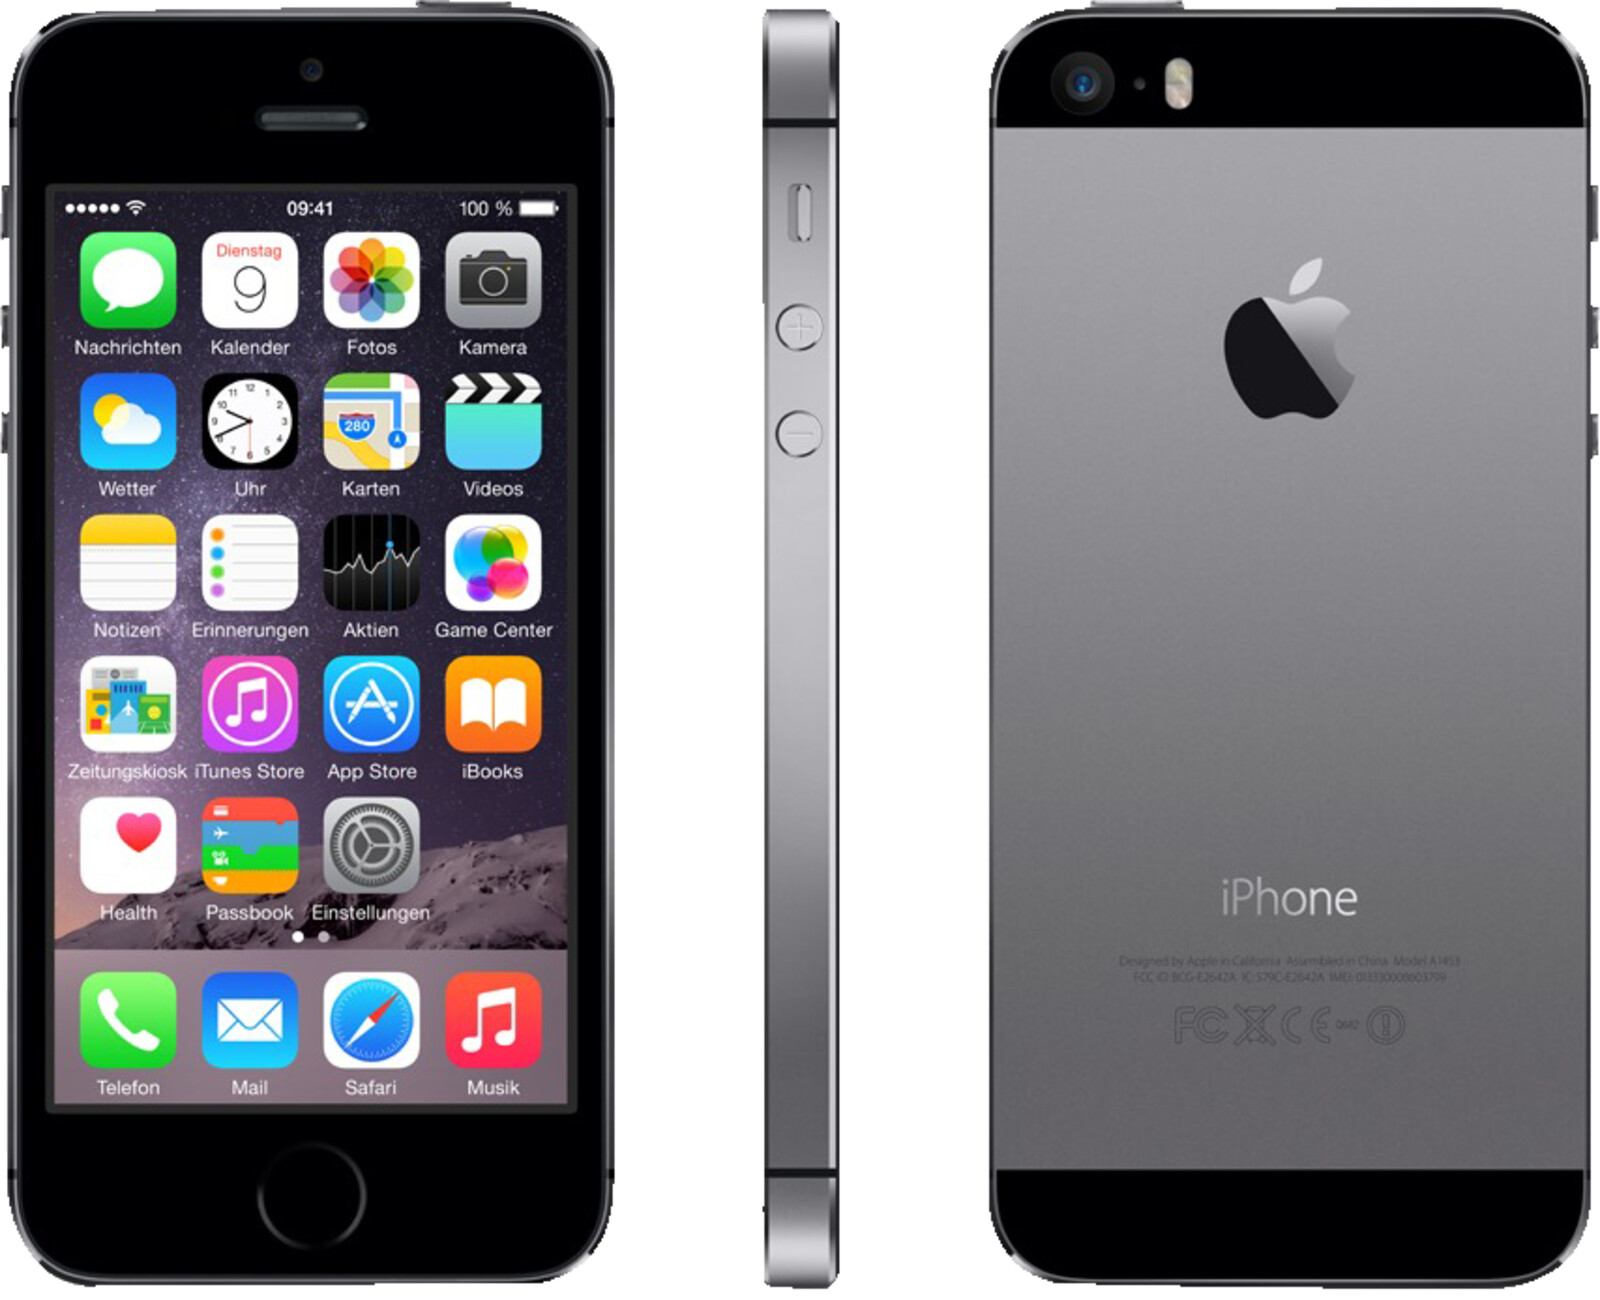 apple iphone 5s smartphone 16 gb 4 zoll grau lte 885909784356 ebay. Black Bedroom Furniture Sets. Home Design Ideas